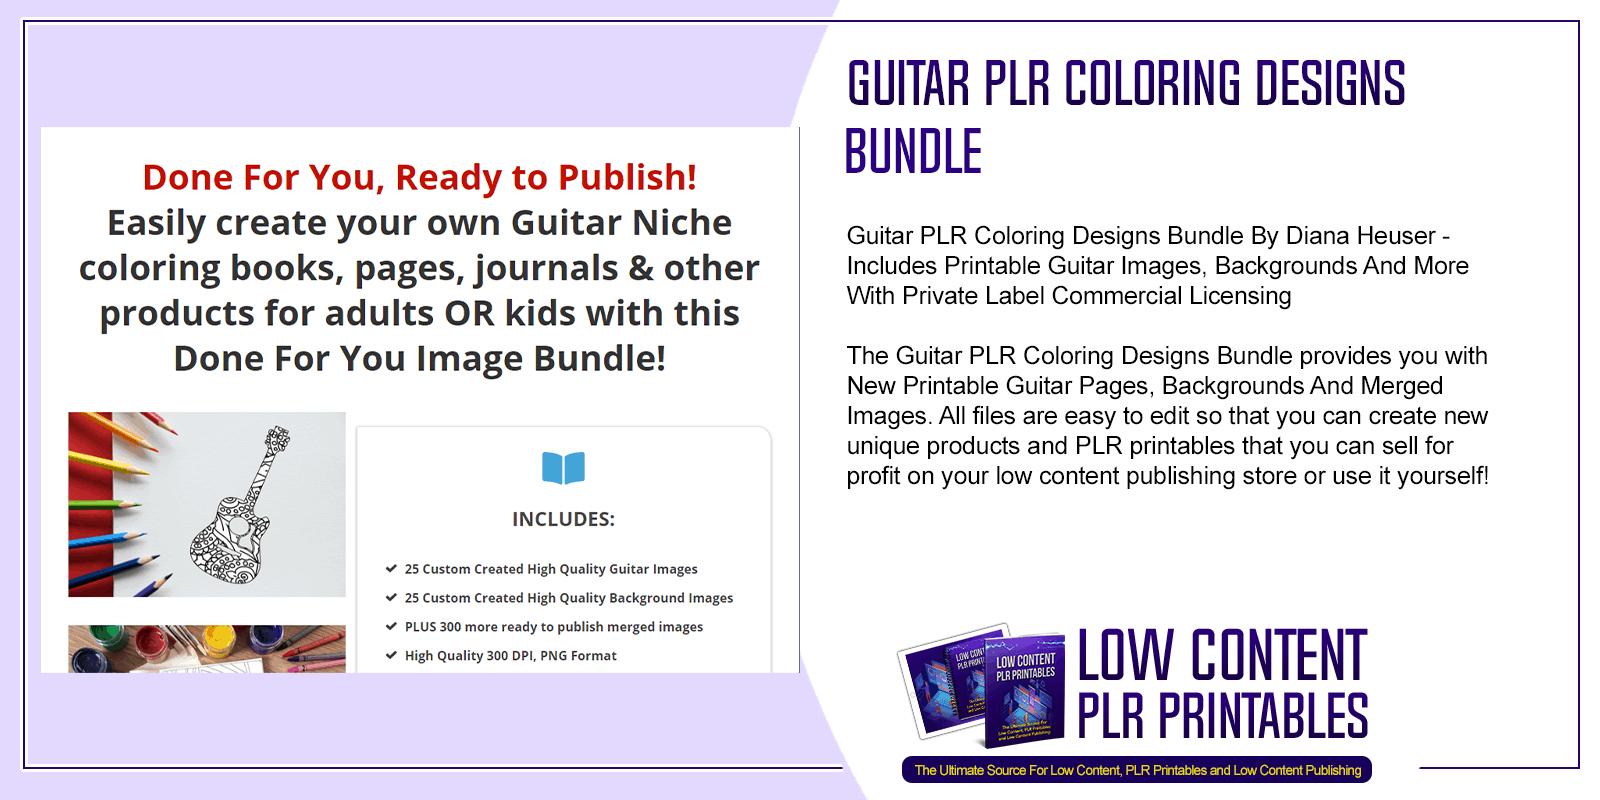 Guitar PLR Coloring Designs Bundle